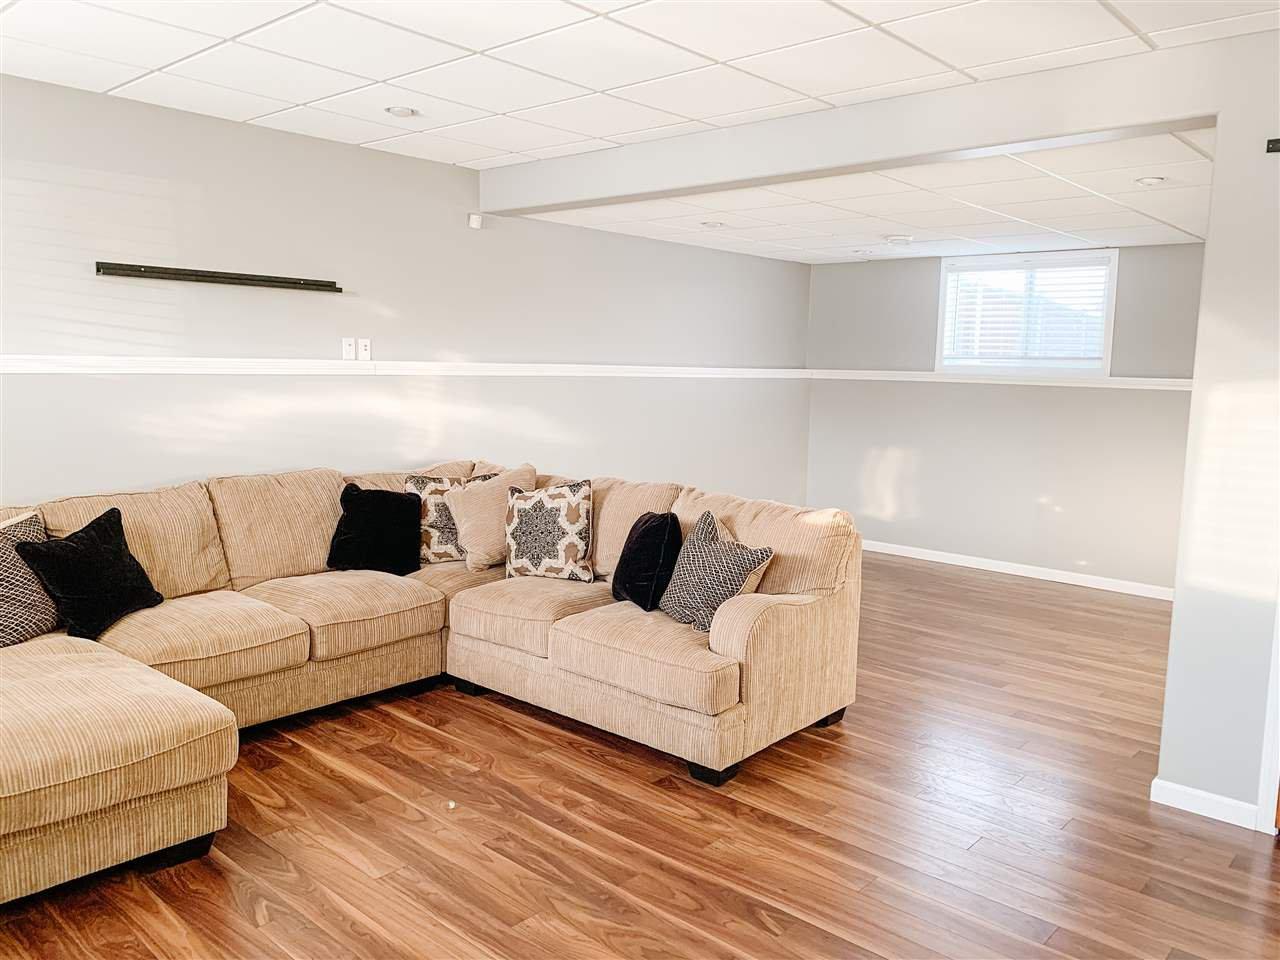 "Photo 15: Photos: 8724 114 Avenue in Fort St. John: Fort St. John - City NE House for sale in ""PANORAMA RIDGE"" (Fort St. John (Zone 60))  : MLS®# R2428633"